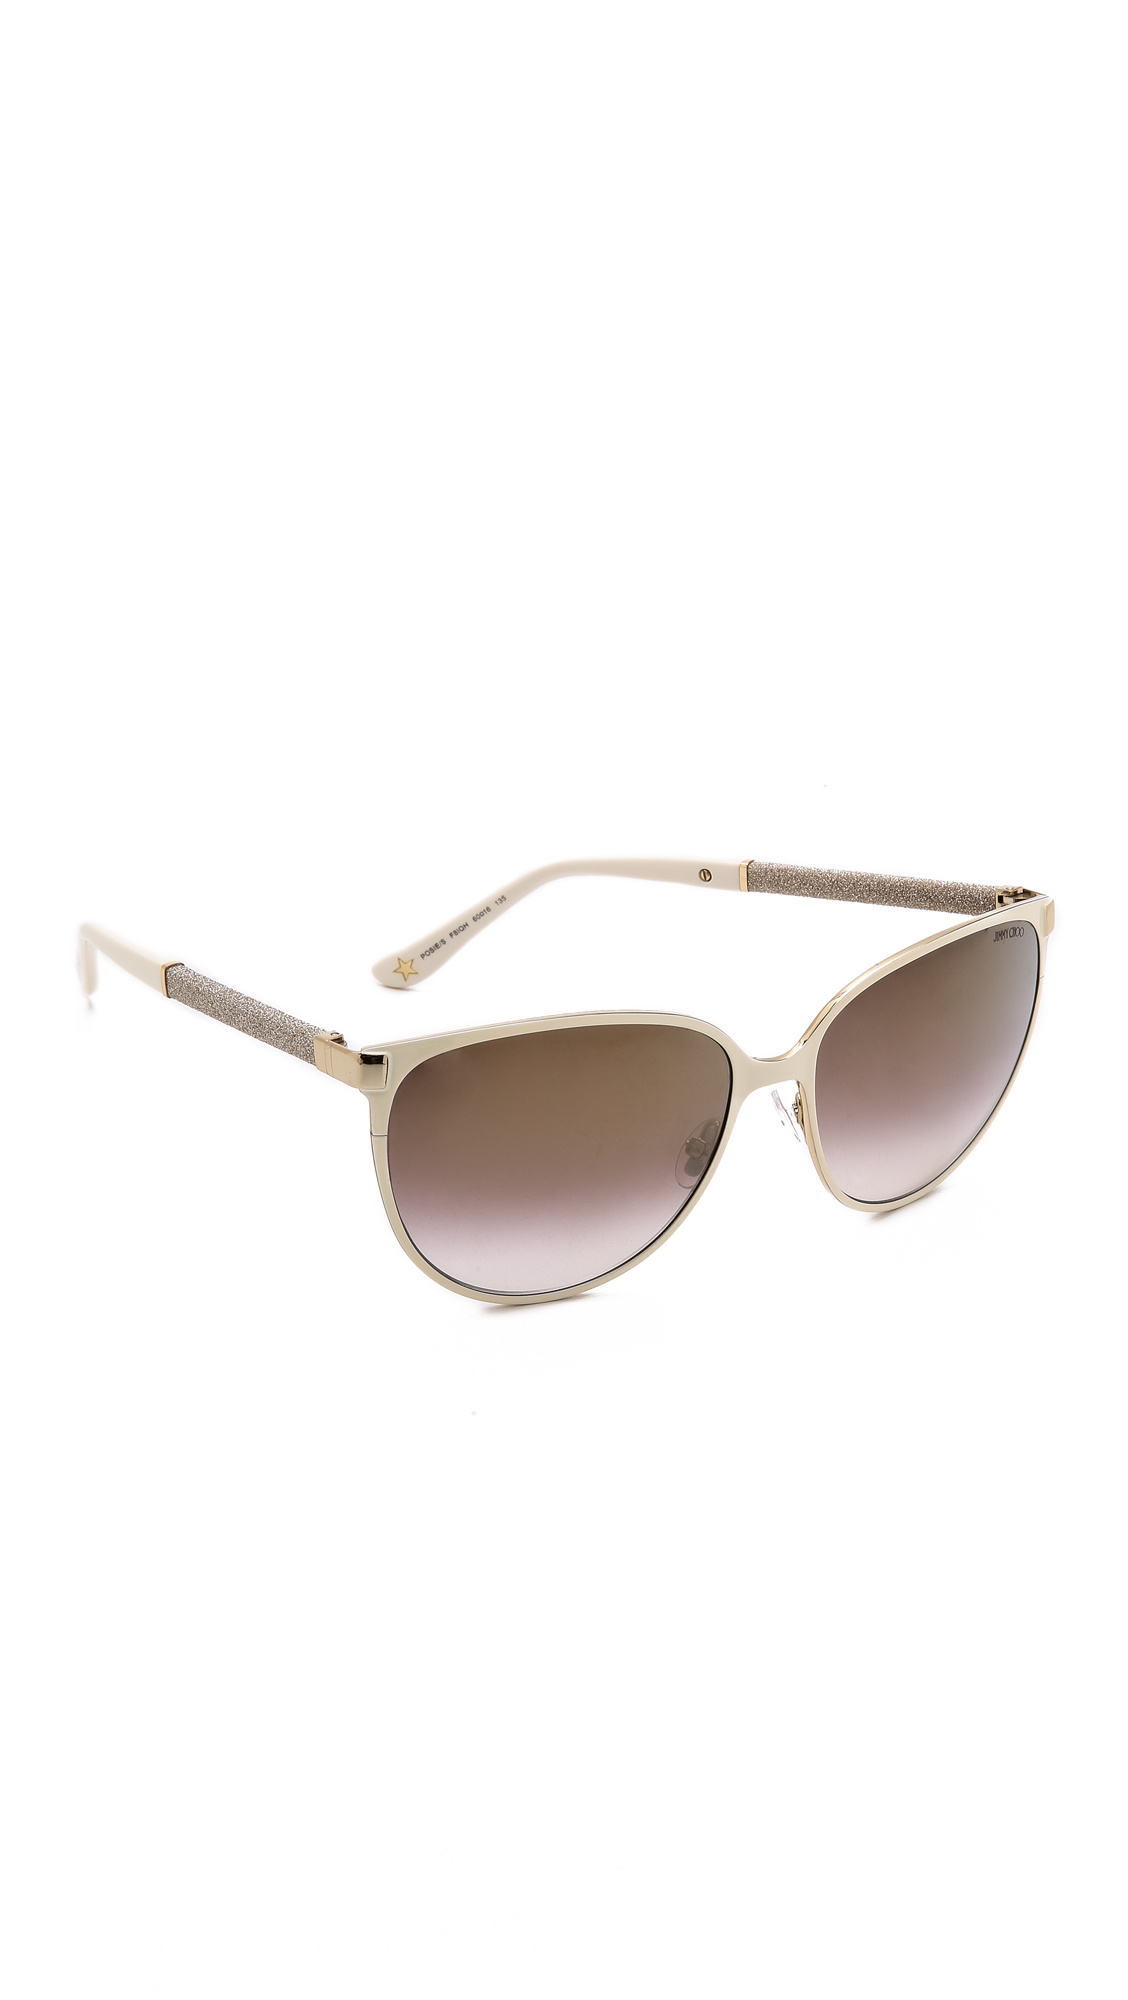 4e1ab5f5190 Lyst - Jimmy Choo Posie Sunglasses - Ivory brown in White